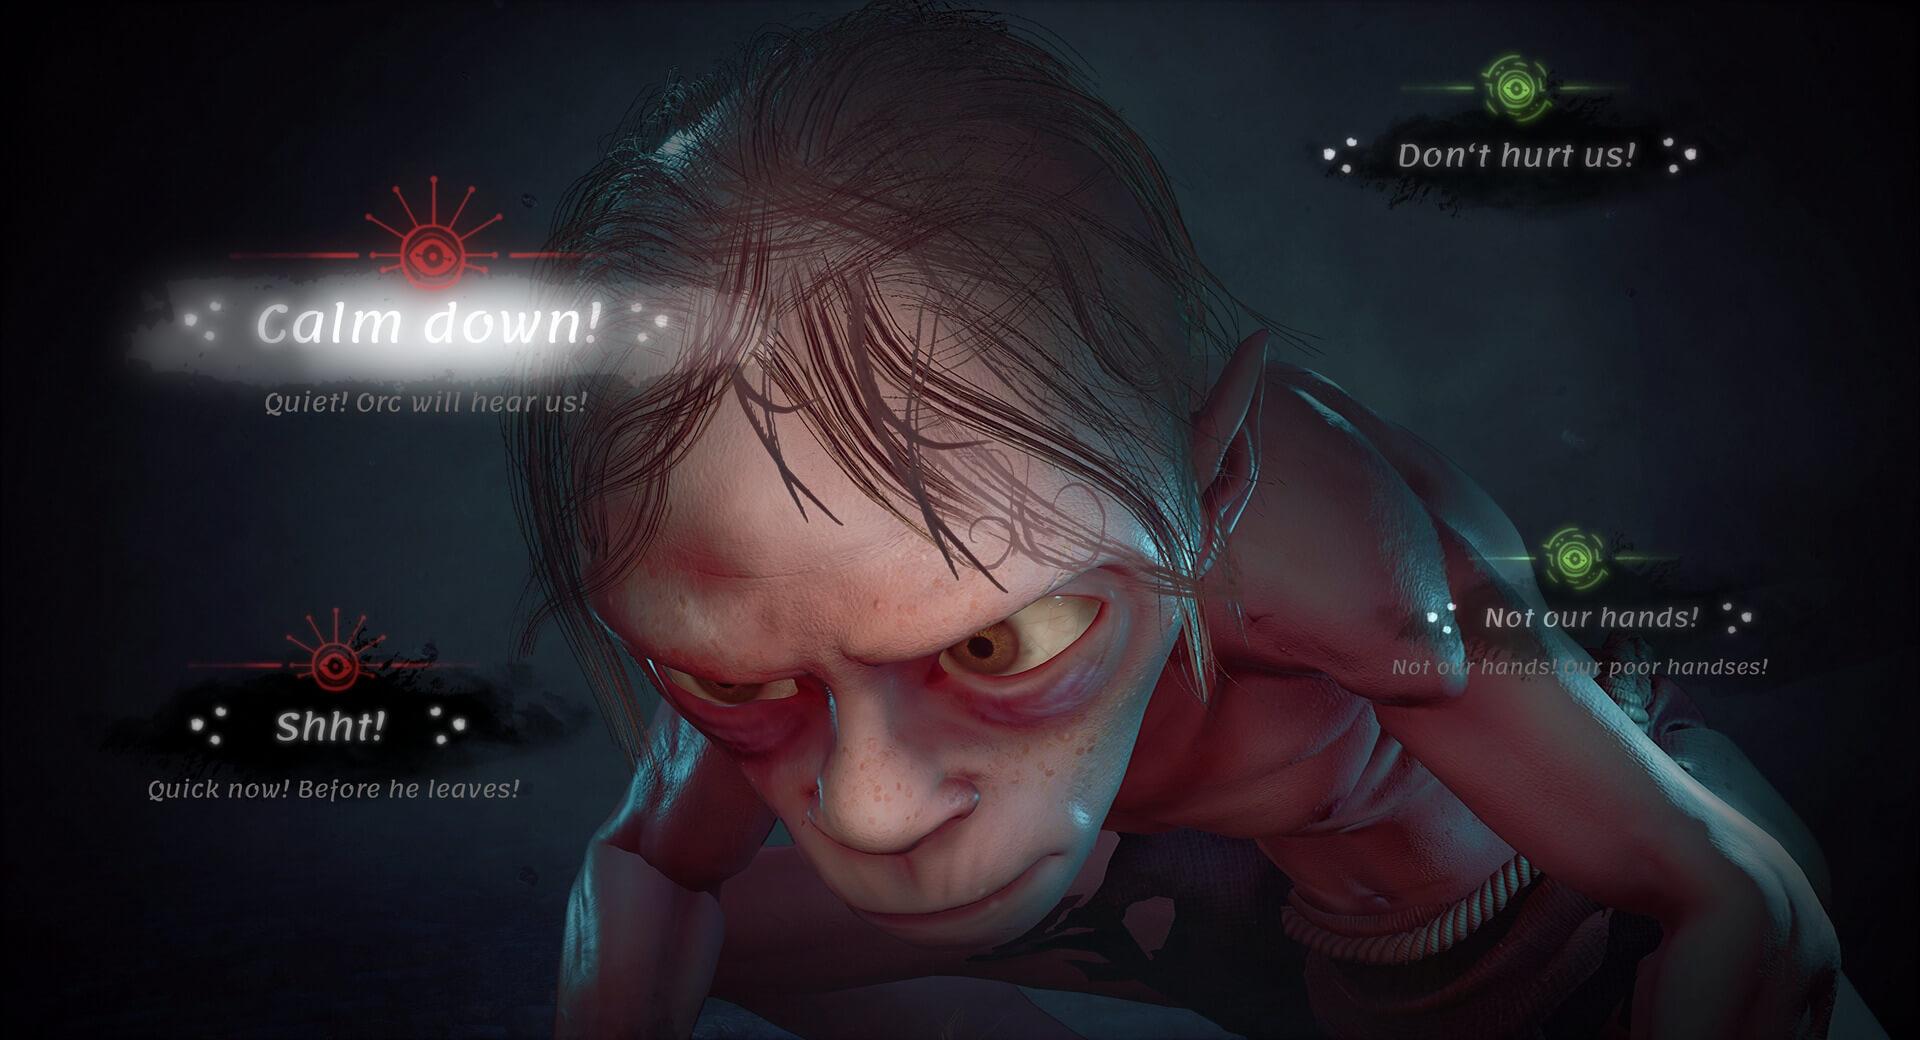 Голлум ижуткие пауки напервых скриншотах Lord ofthe Rings: Gollum